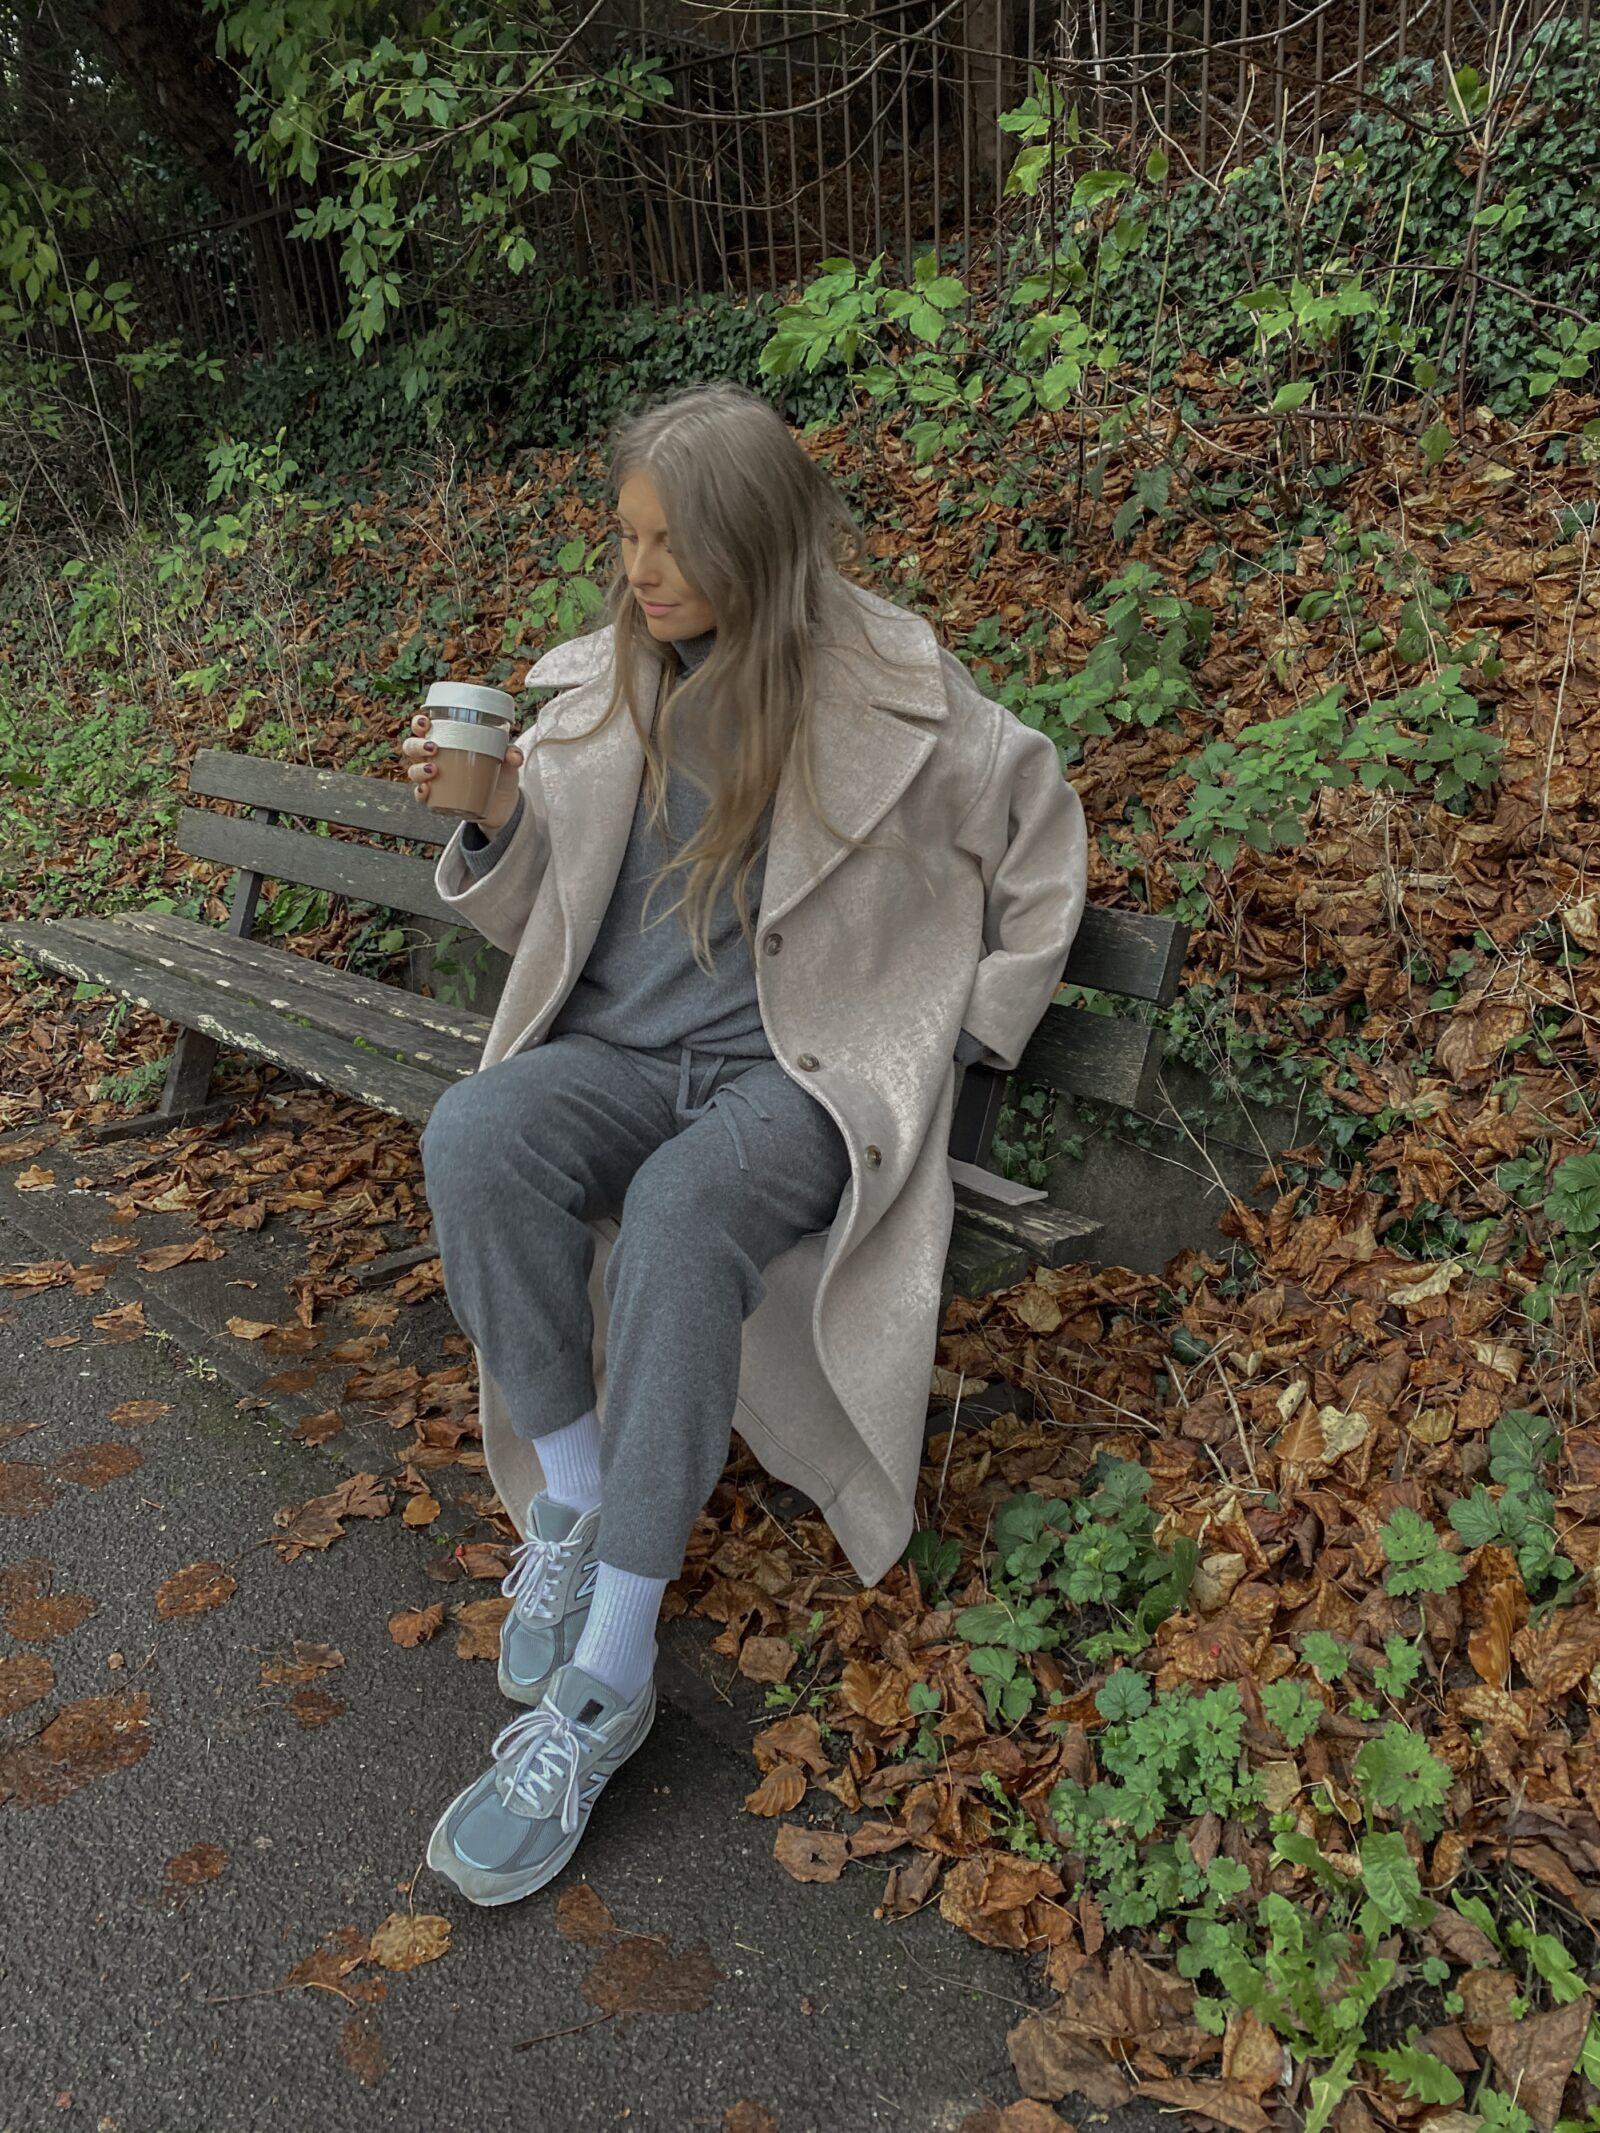 Winter Arket Haul 2020 - Cashmere Outfit